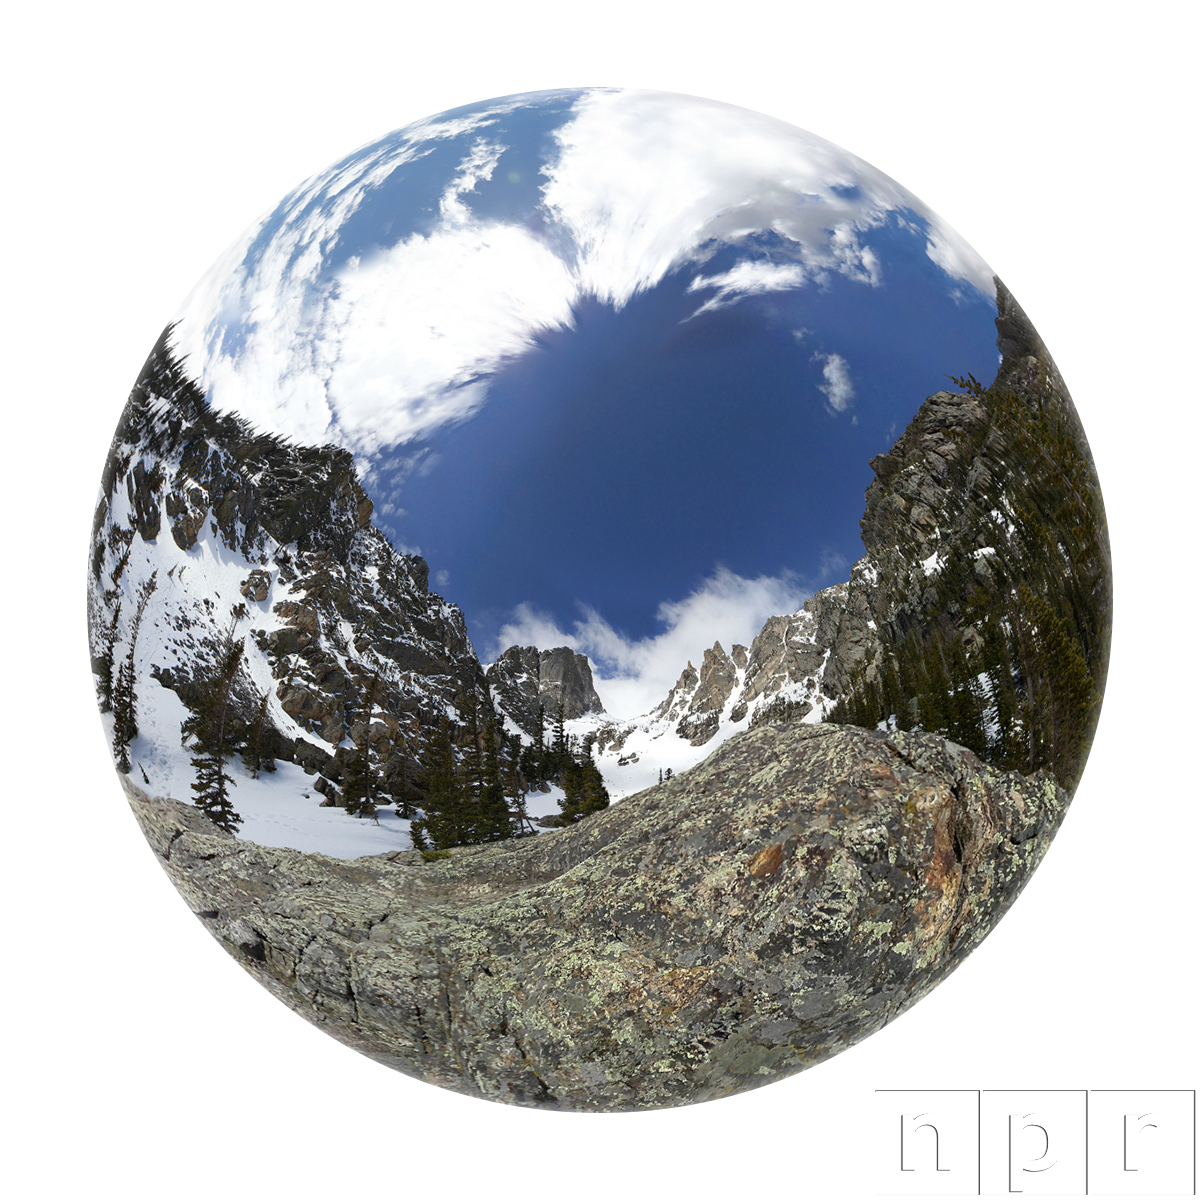 Emerald_Lake_Globe_NPR.jpg